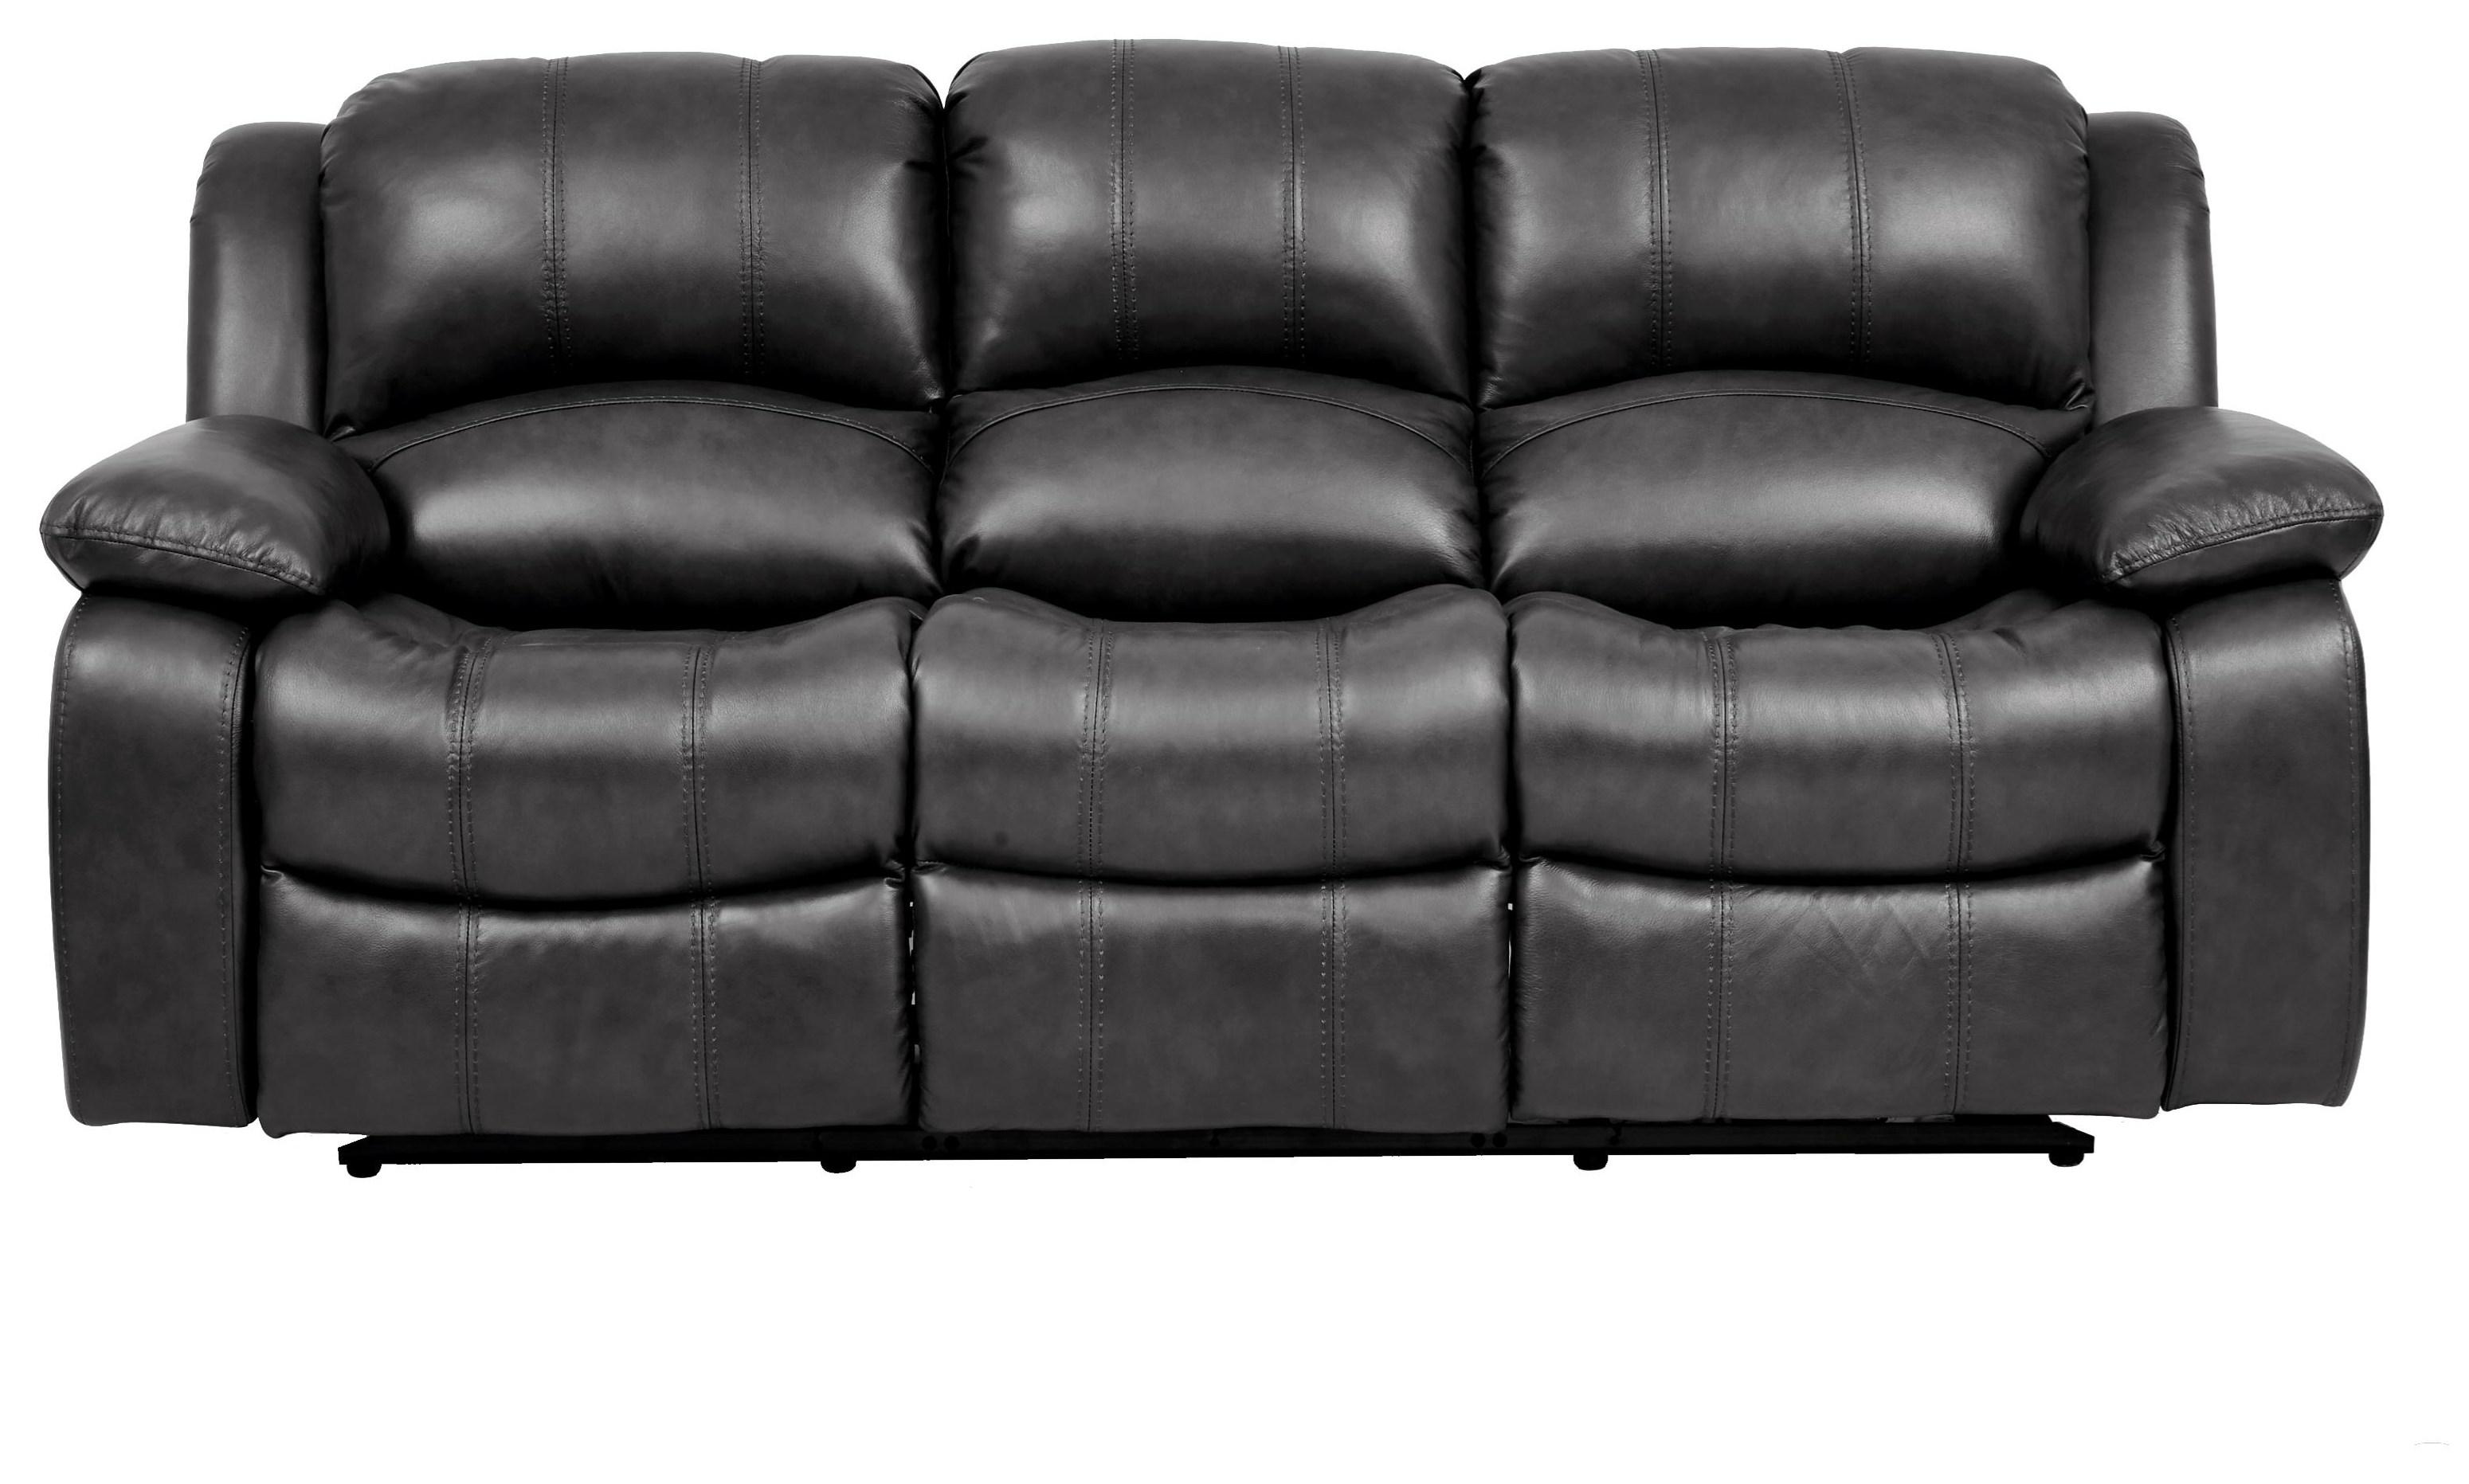 Greystone Leather Reclining Sofa